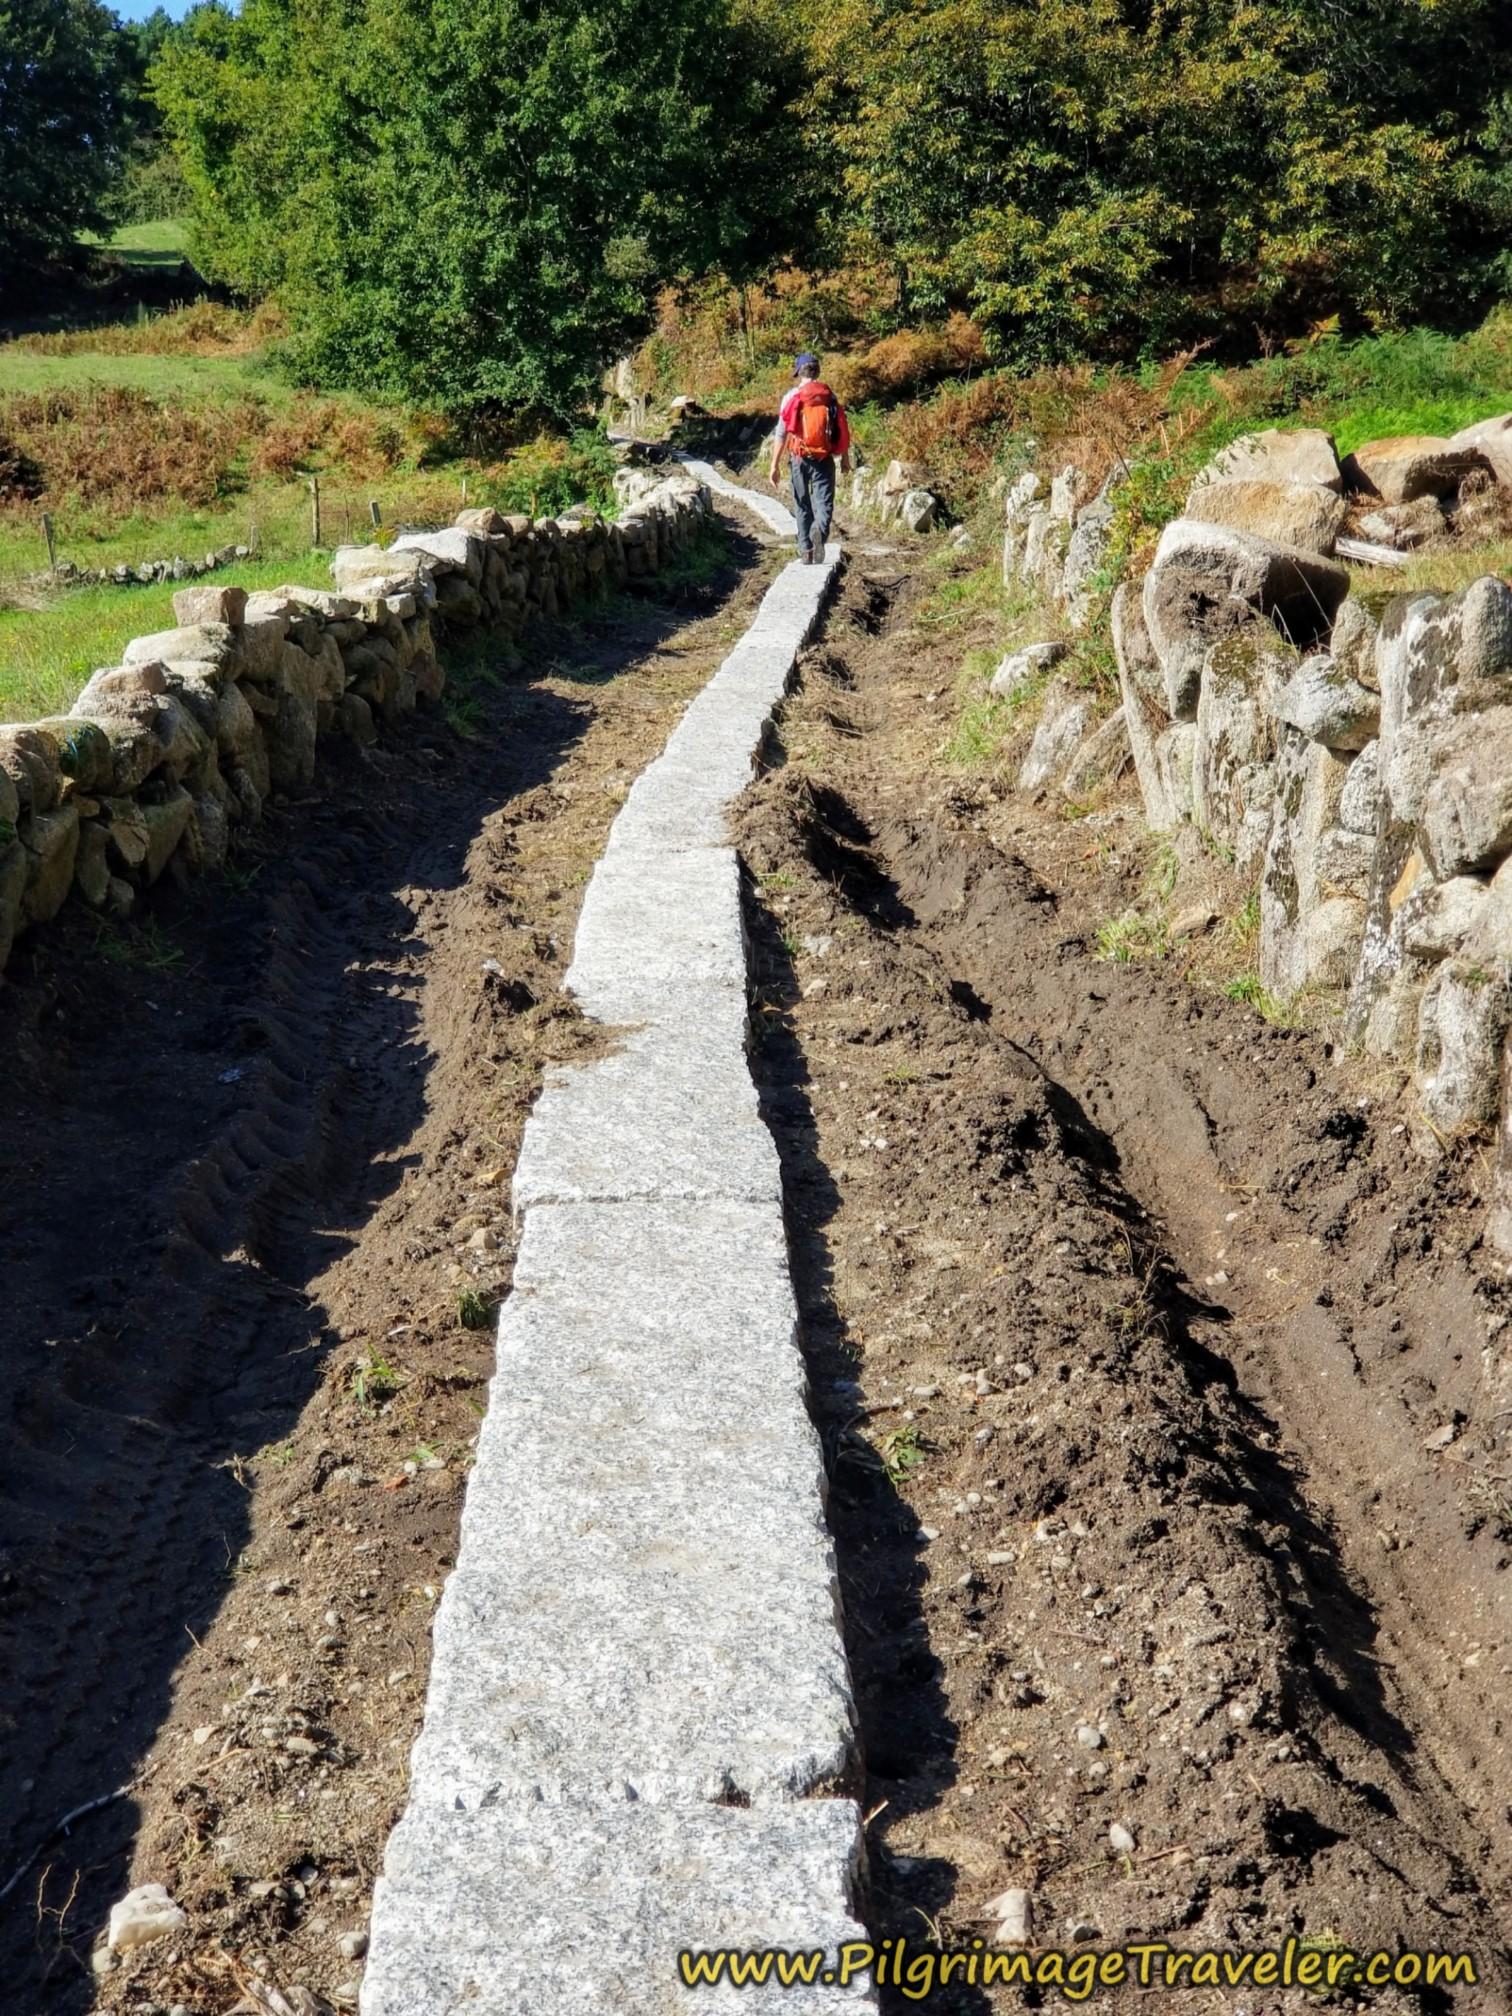 More Path Improvements